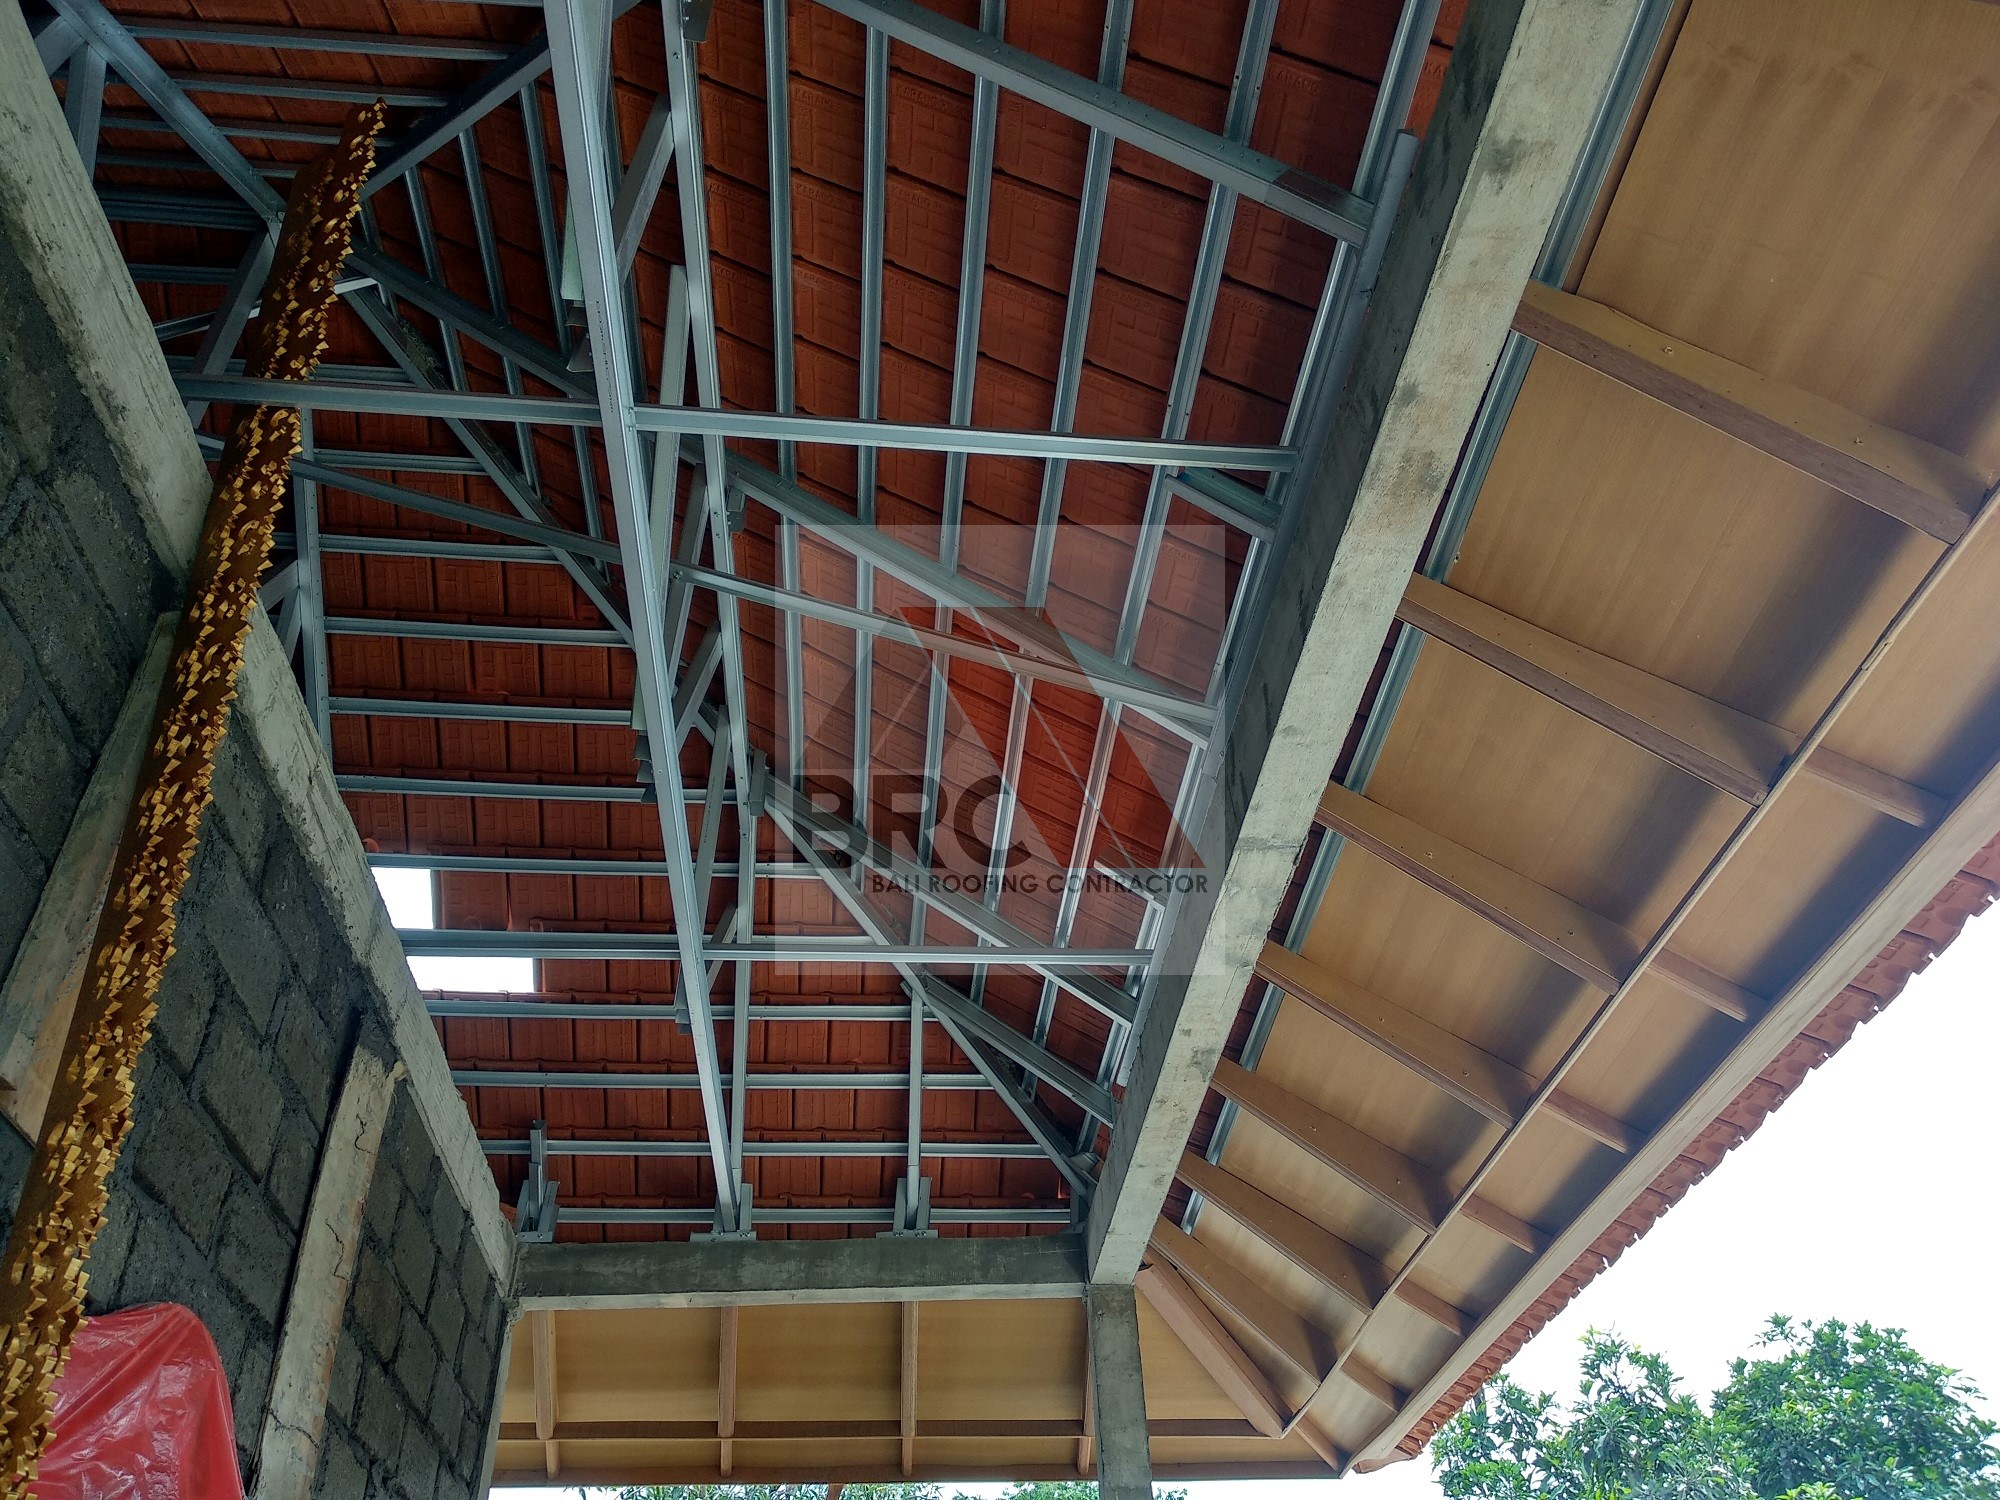 lisplang kanopi baja ringan bali roofing – solusi atap berkualitas di